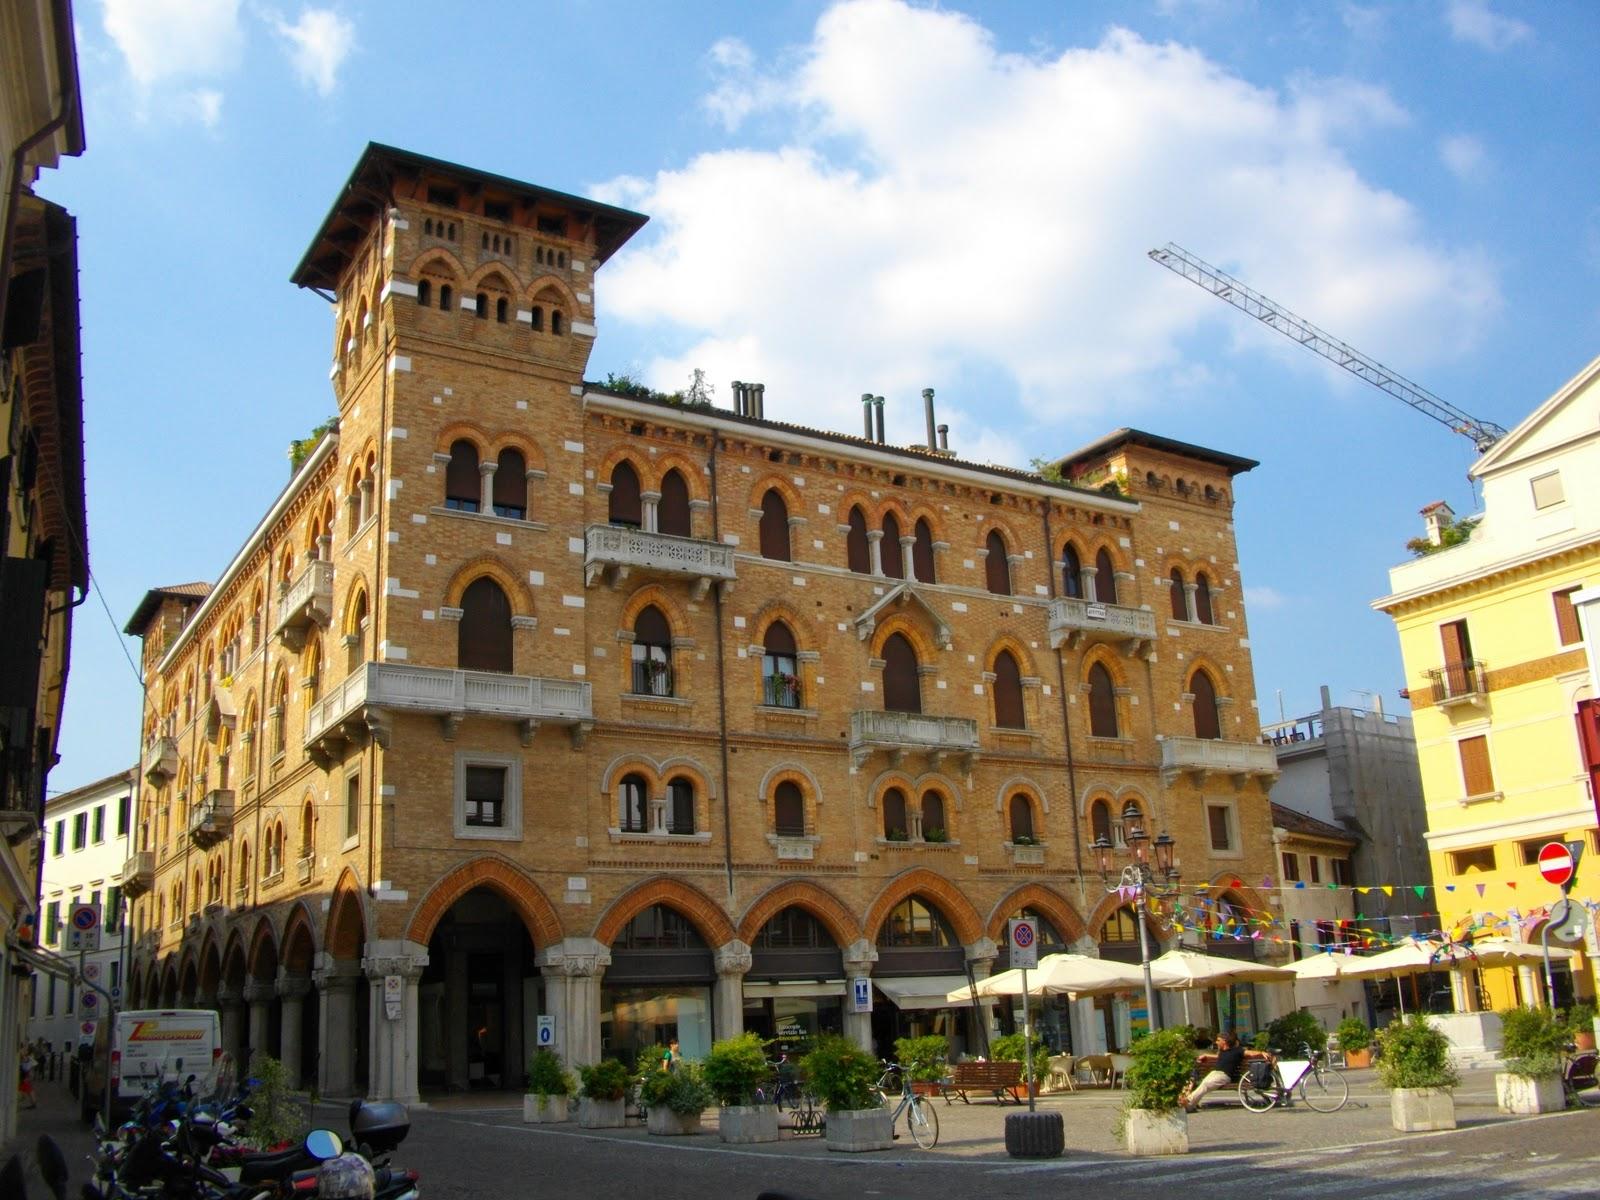 Hotels In Treviso Italy